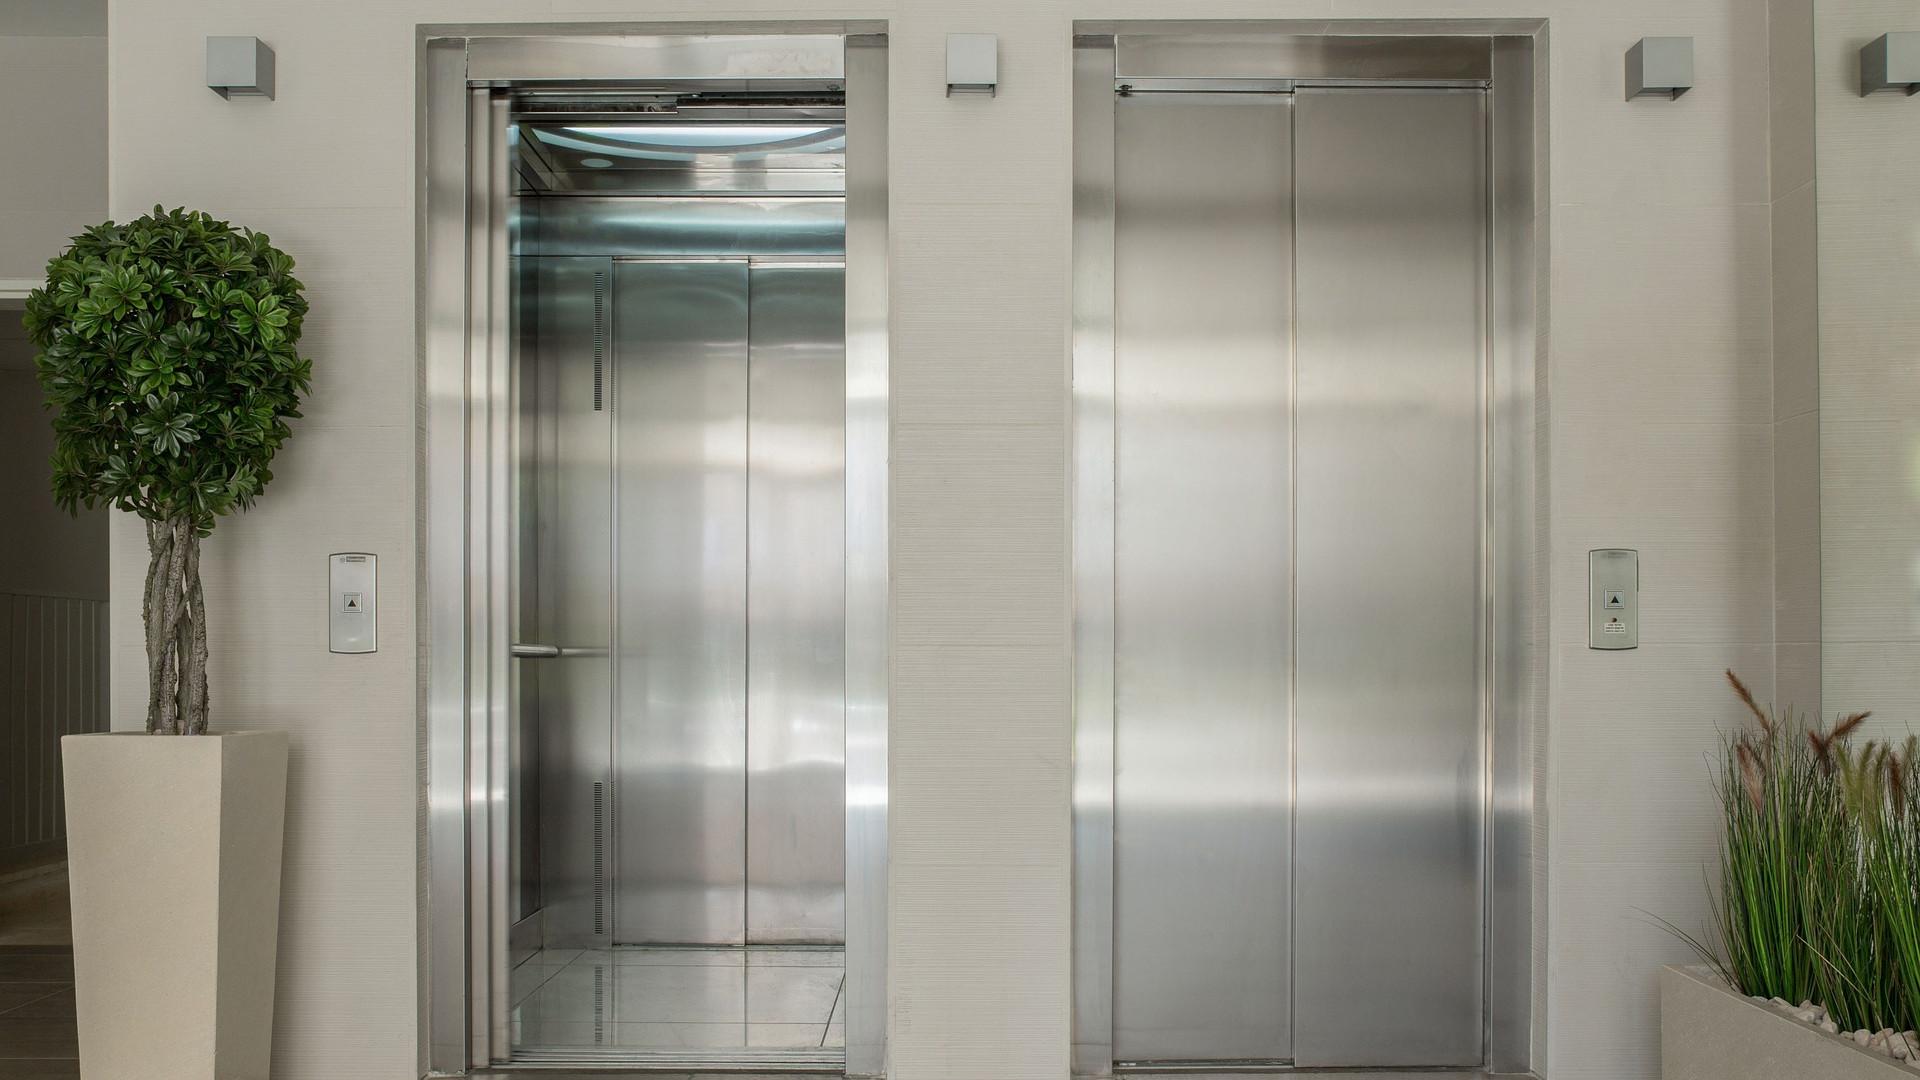 elevators-1756630_1920